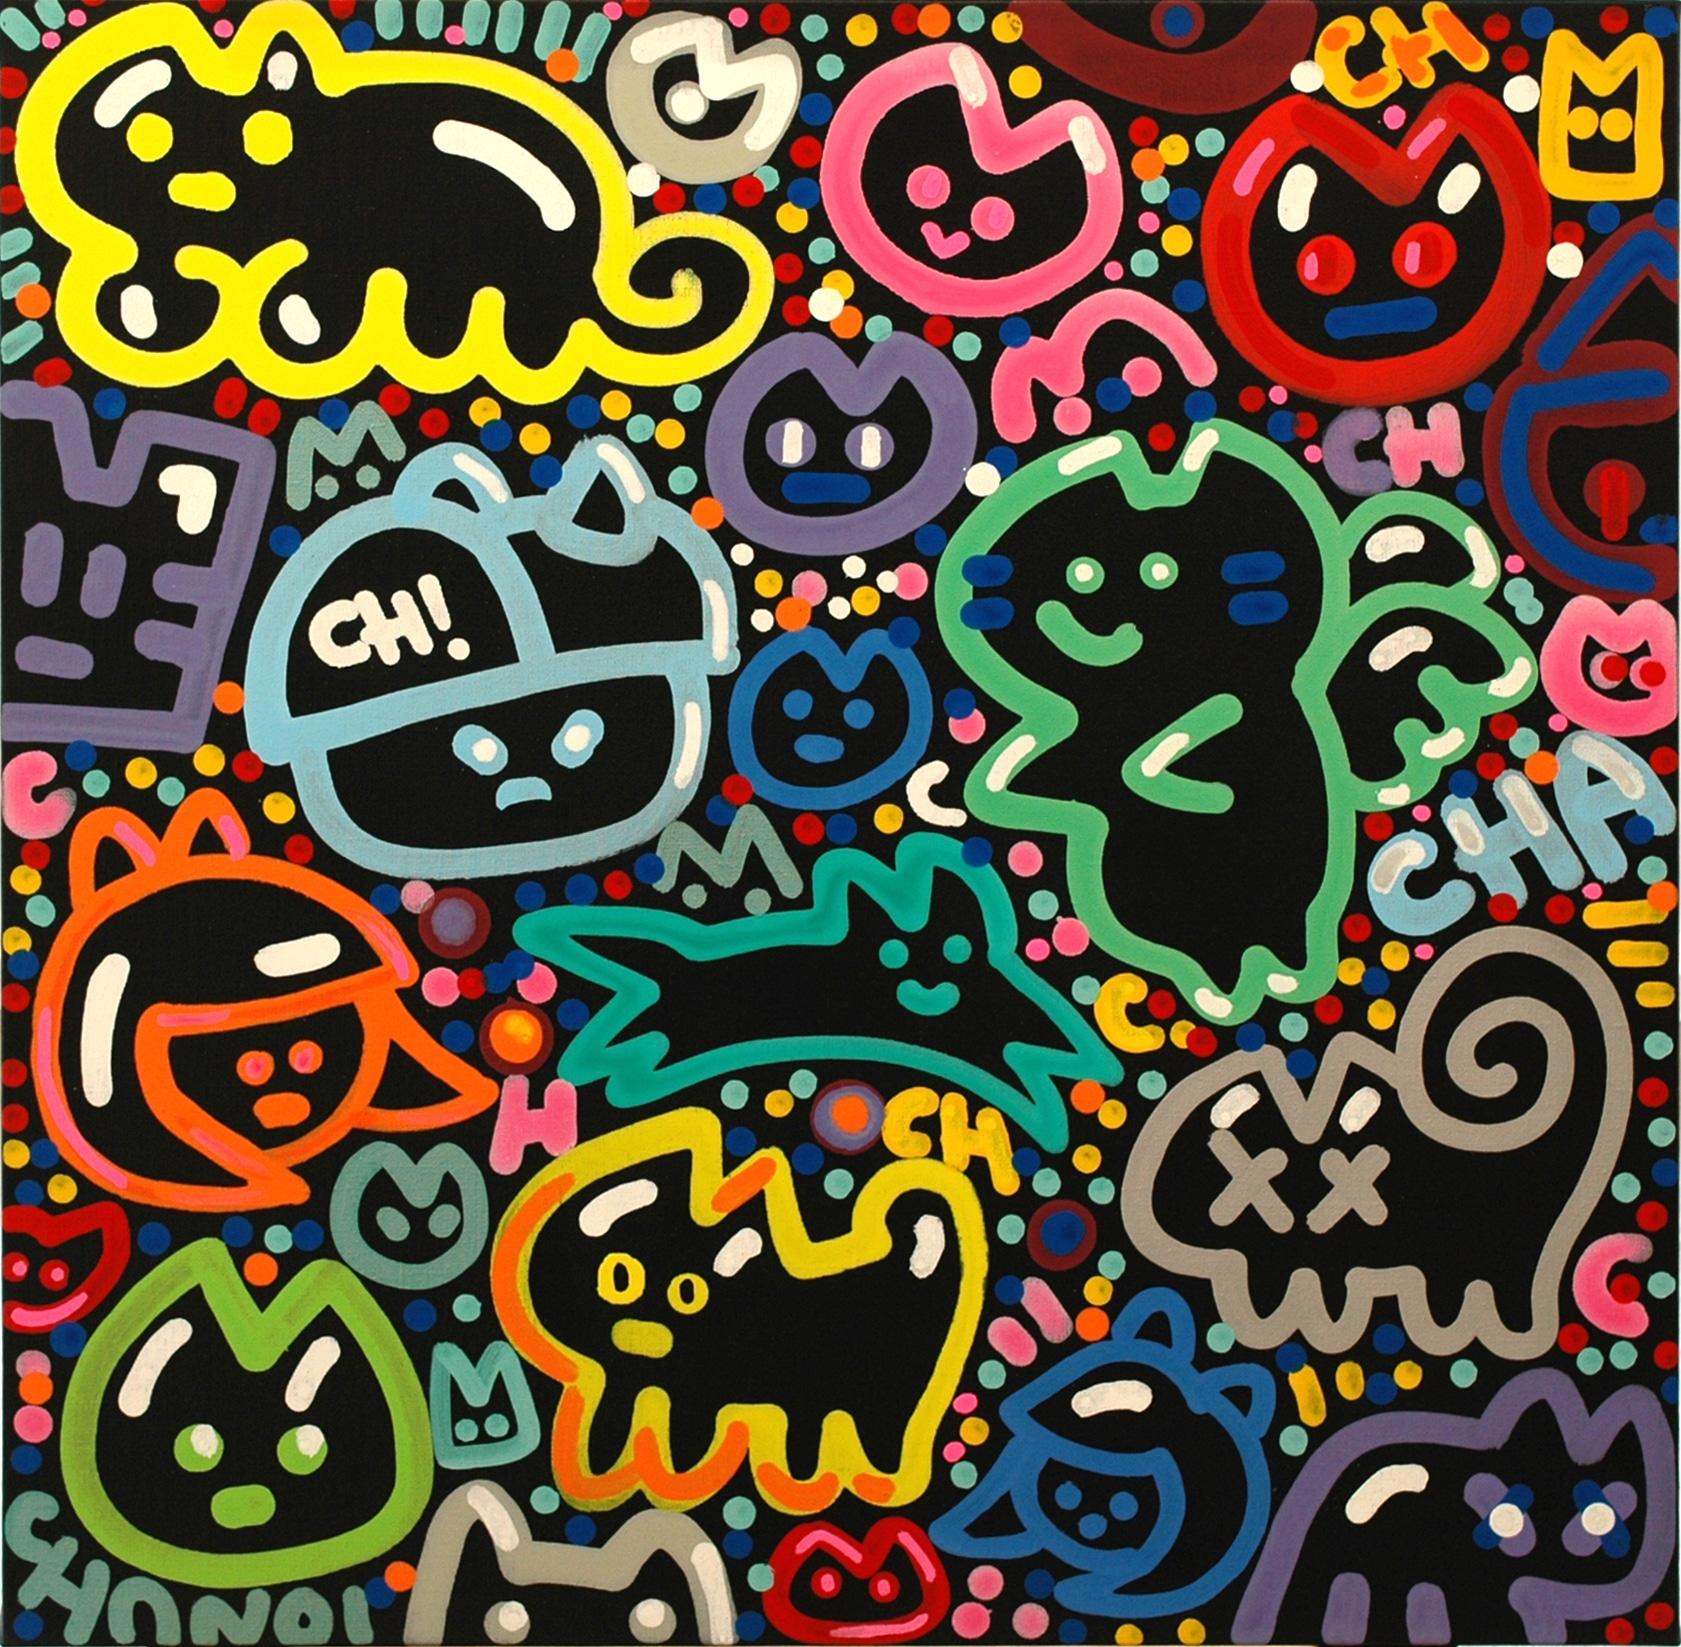 article street artiste chanoir, My name is CHANOIR